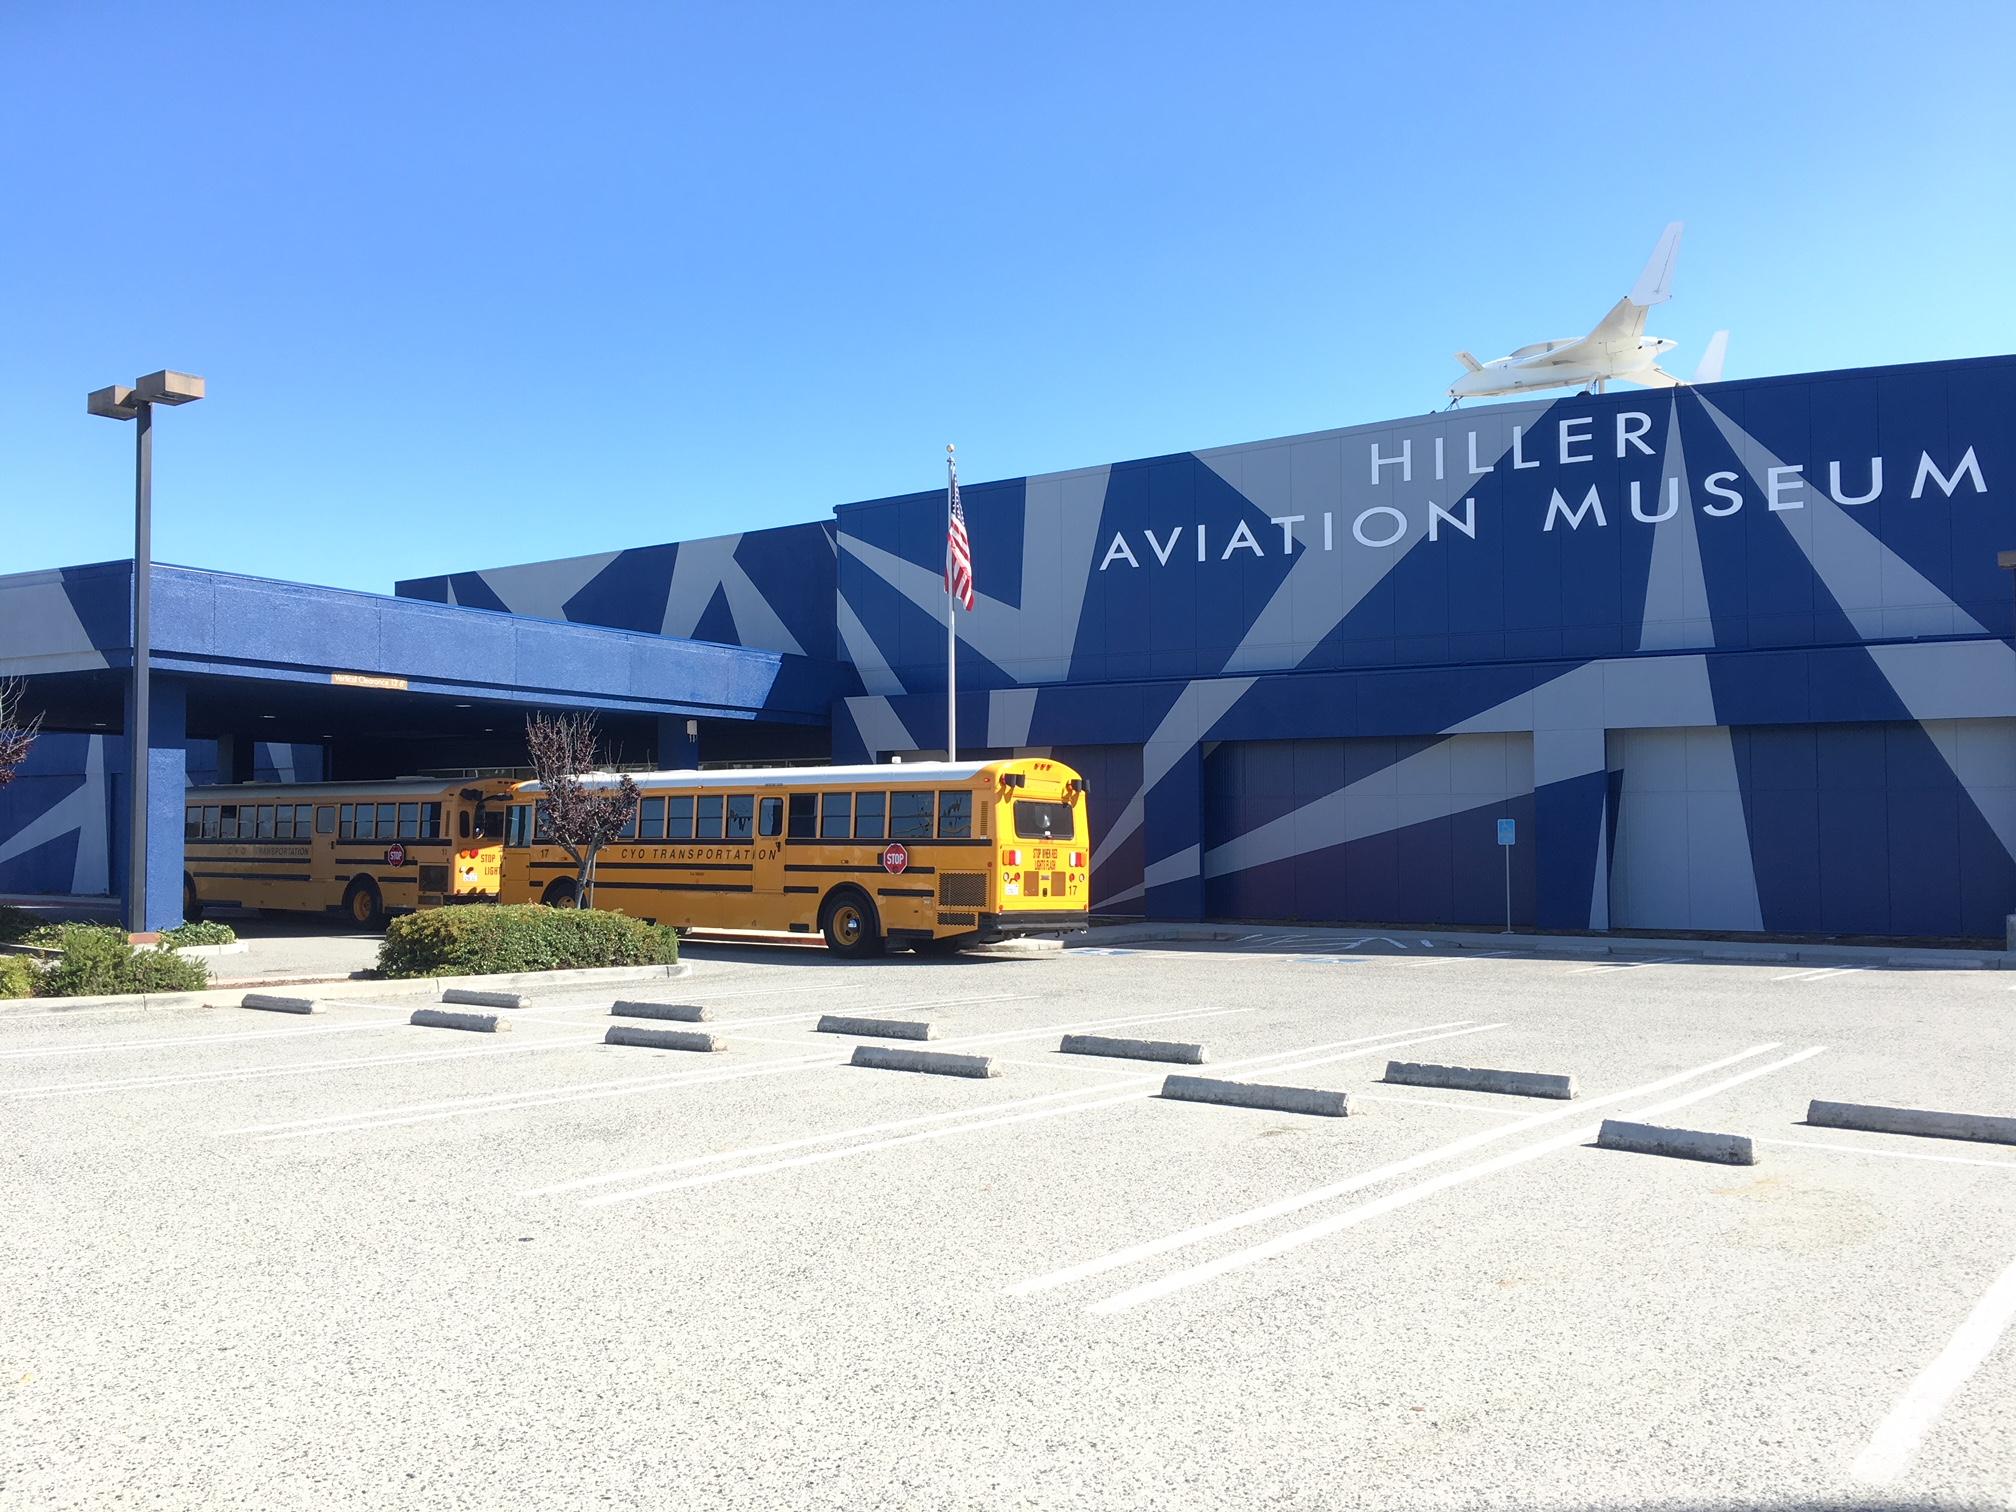 School Groups Arriving at Hiller Aviation Museum